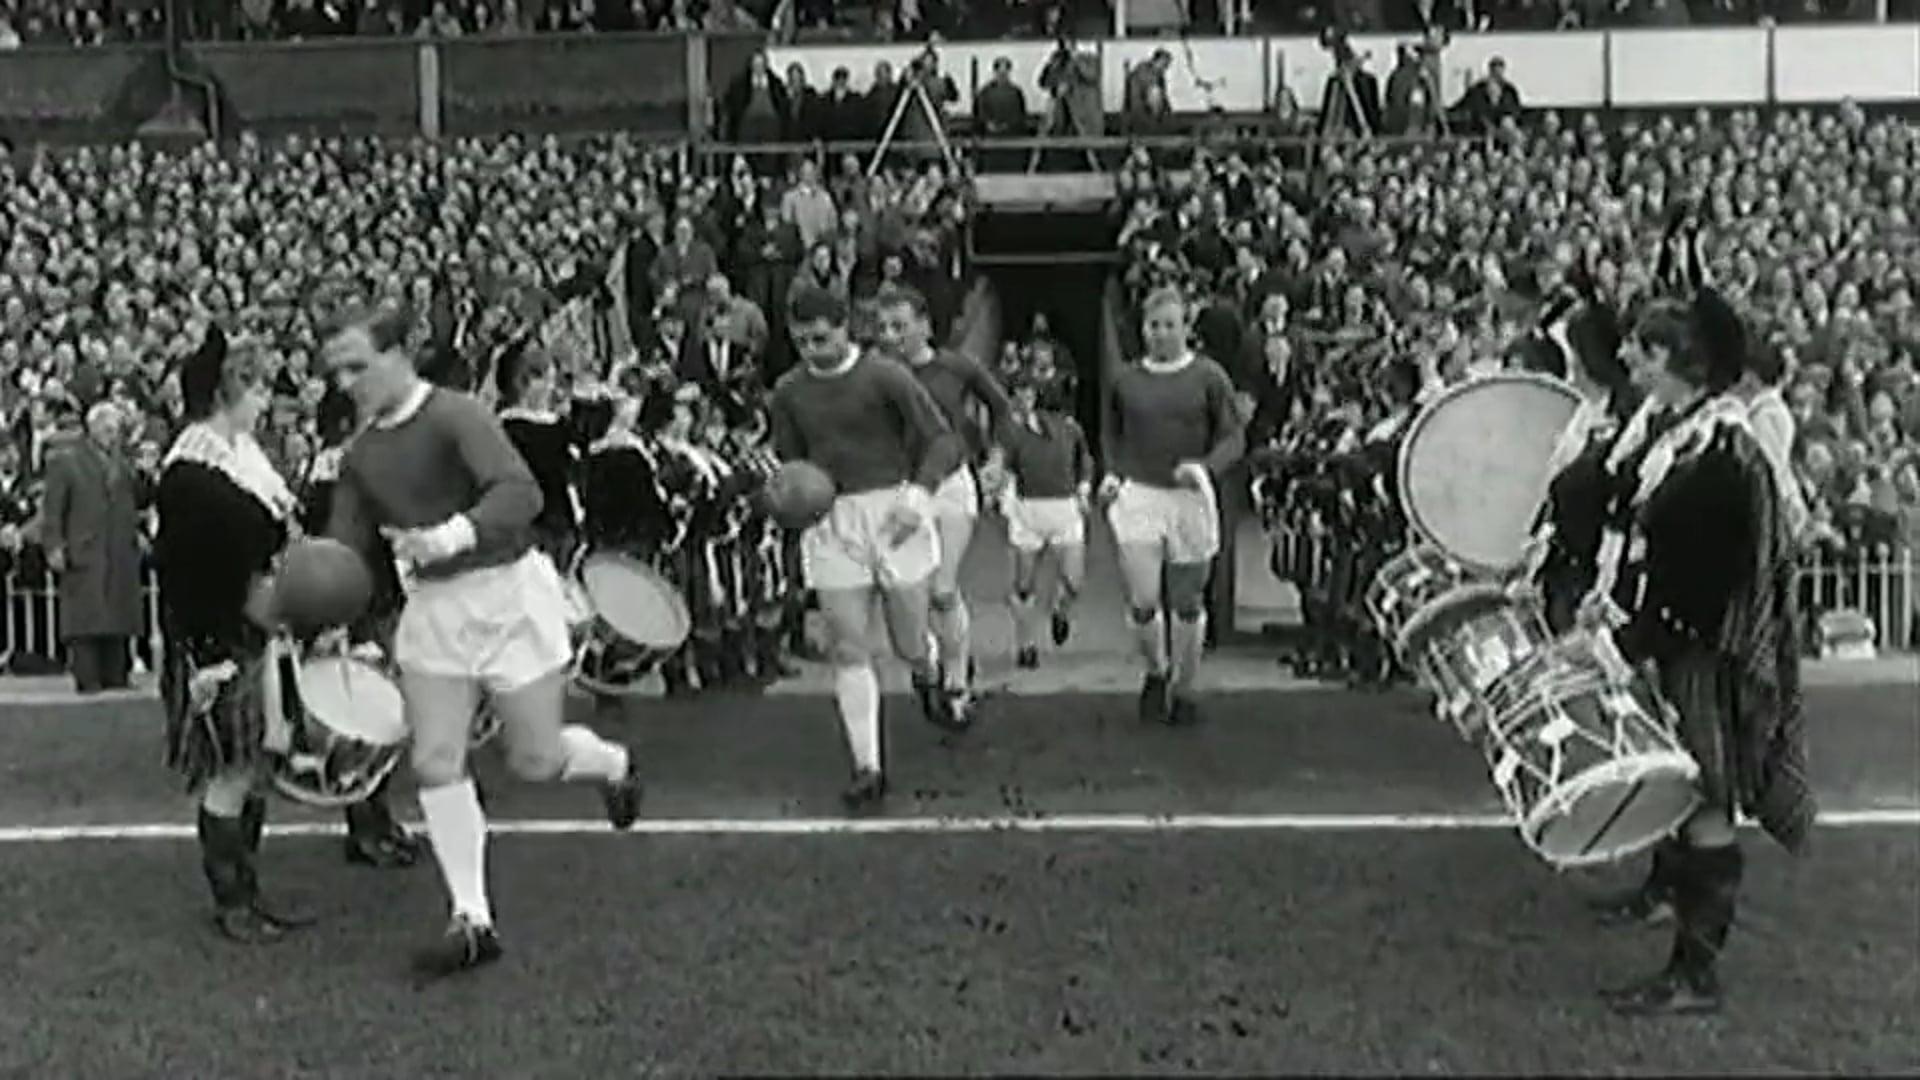 Listen to a Legend - Bobby Charlton